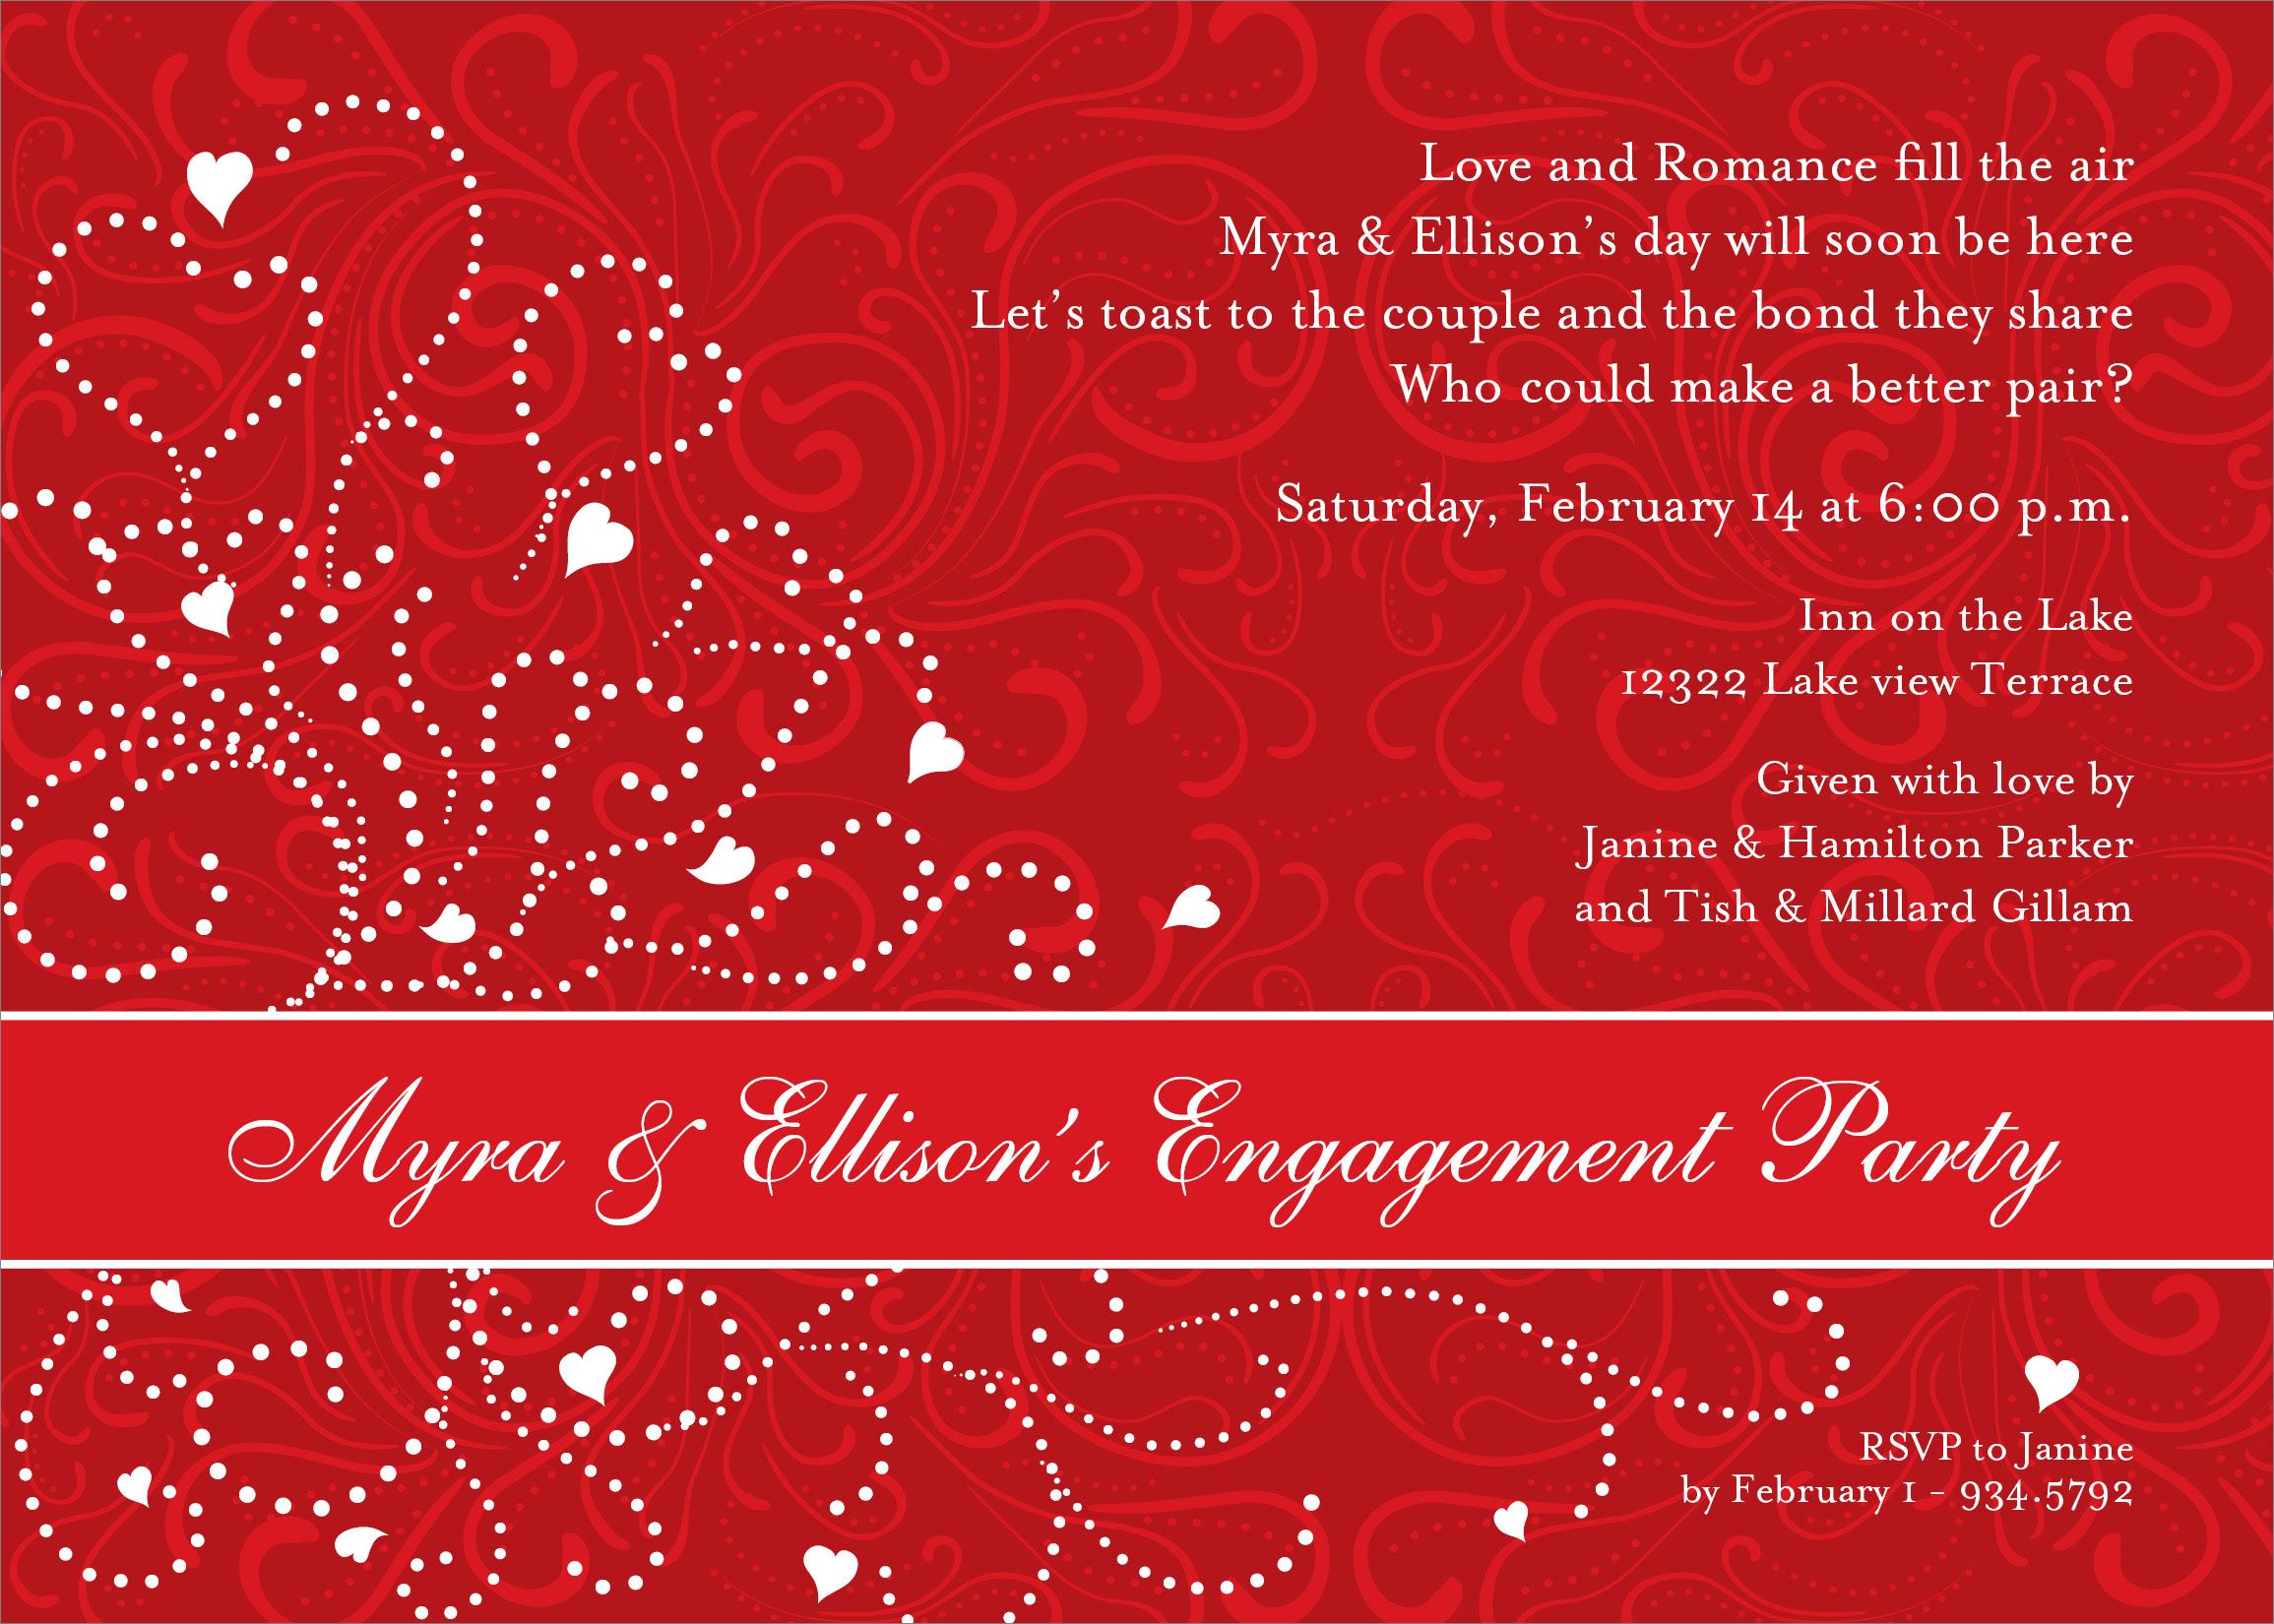 Wedding Invitation Background Designs Red. Lovely Wedding Invitation ...